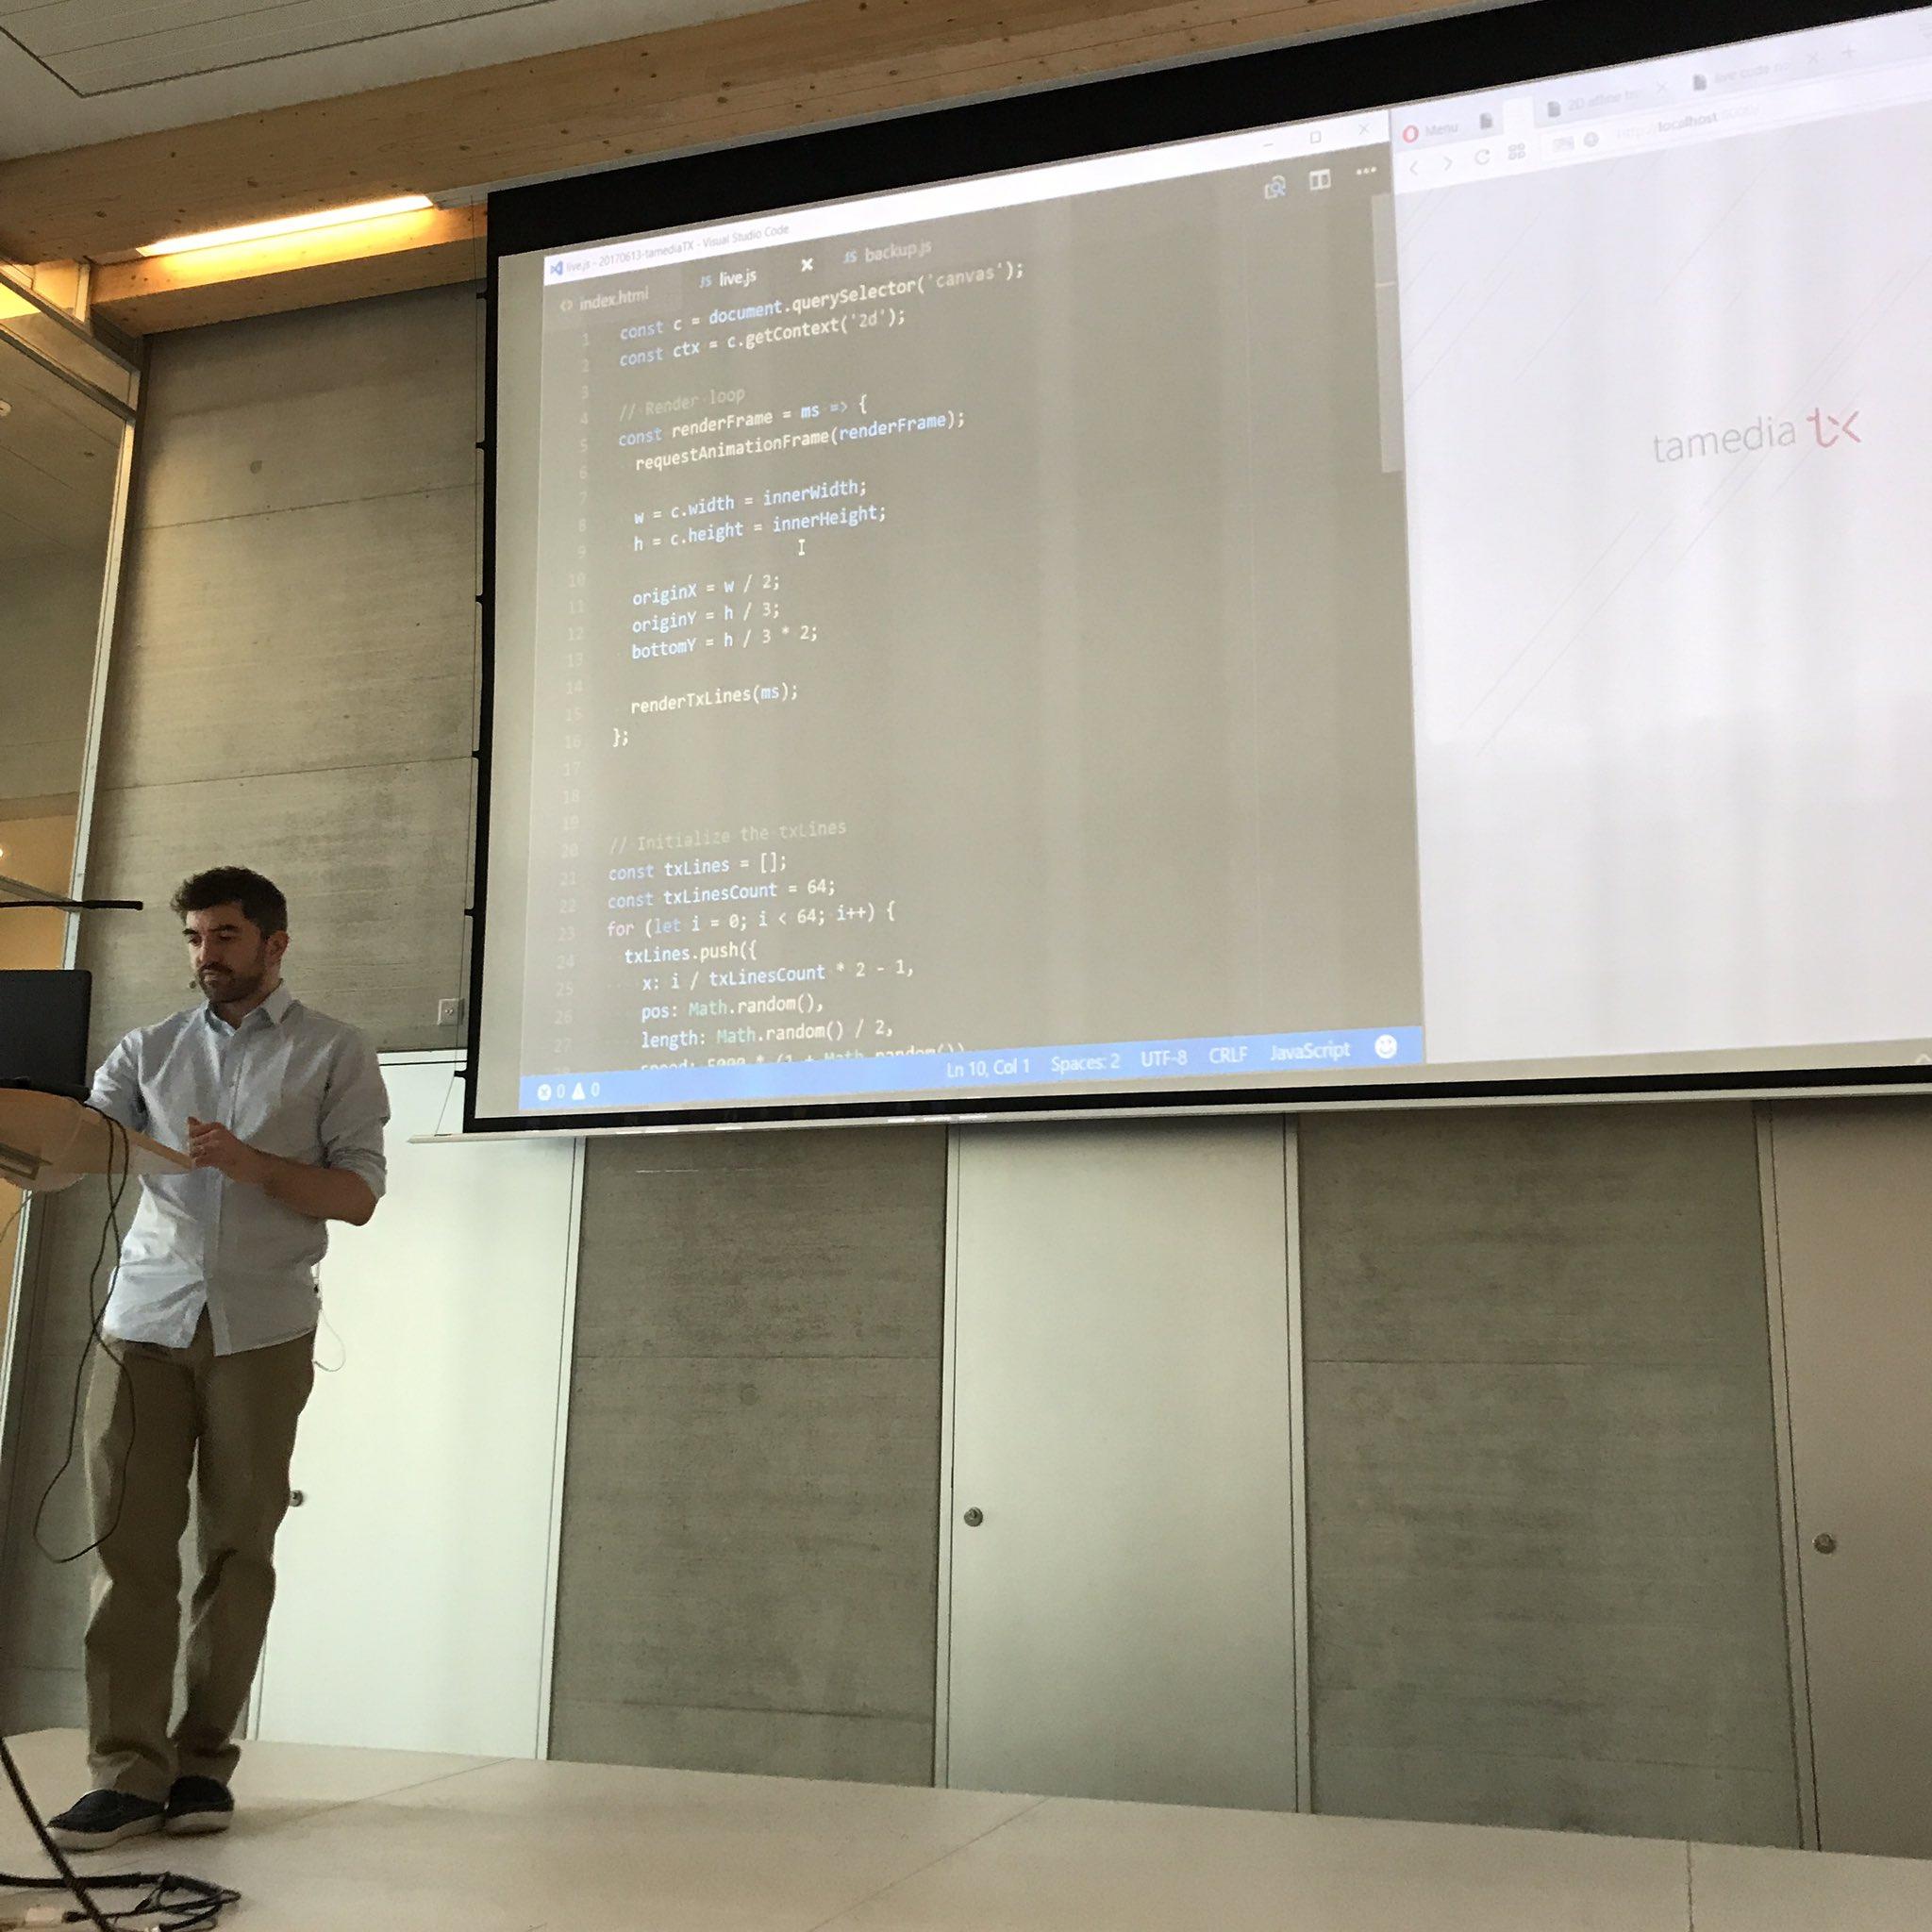 Live coding/art demo by @p01 at #tamediatx #coding https://t.co/q25mAn1xk7